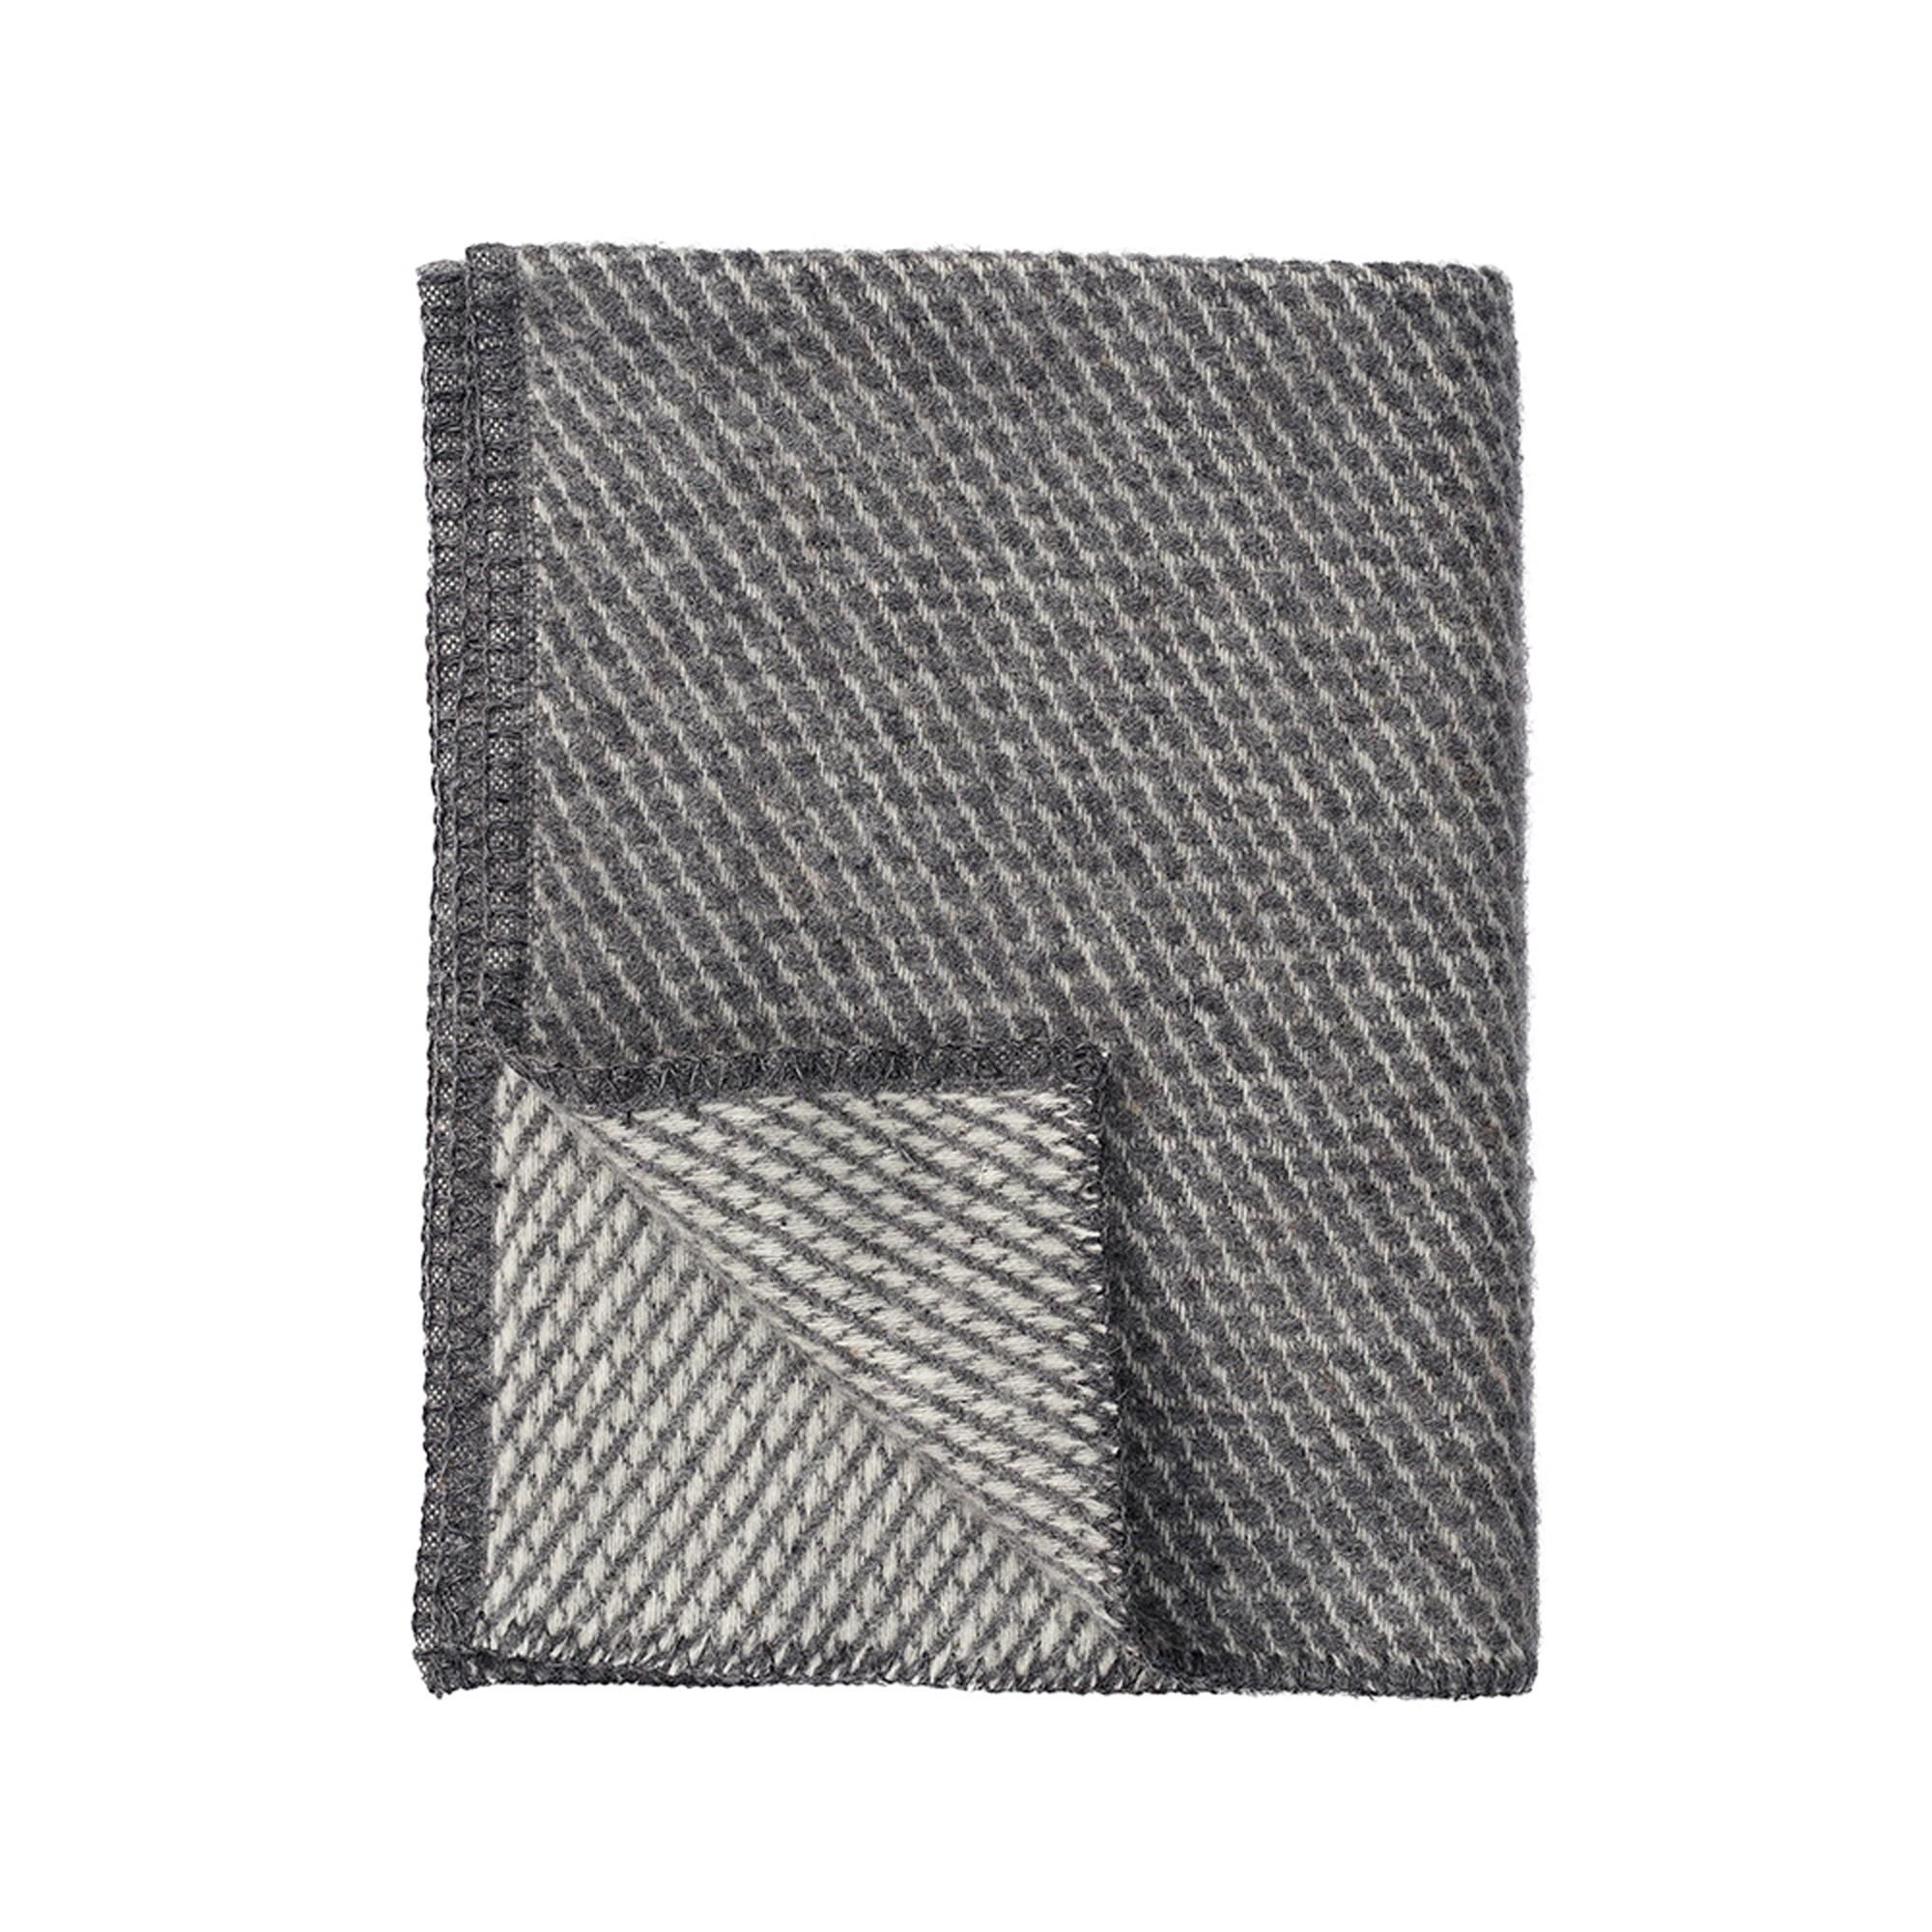 Designtorget Barnpläd Velvet 90x130 grå